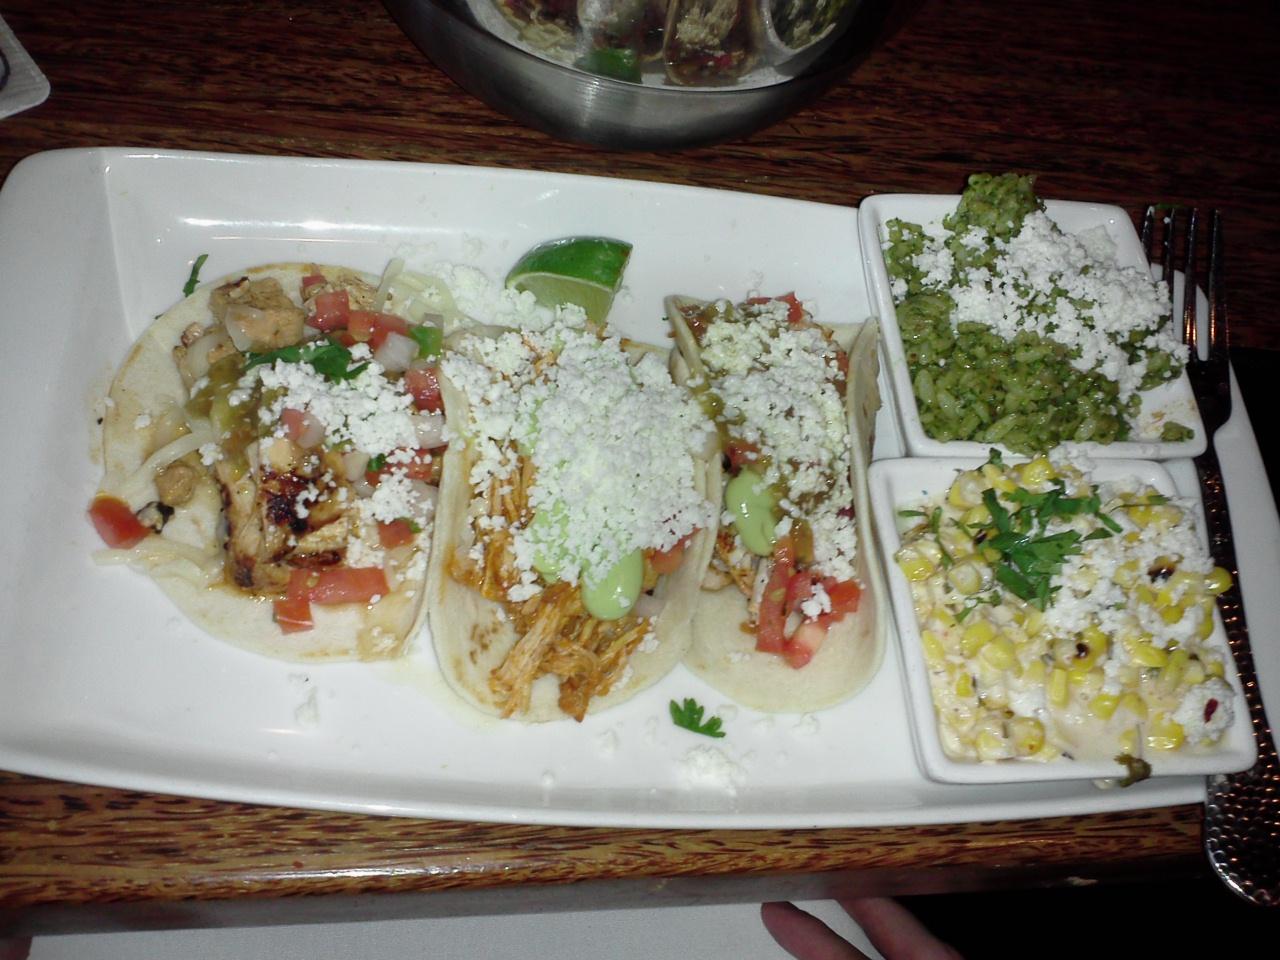 Urban taco 3 taco dinner